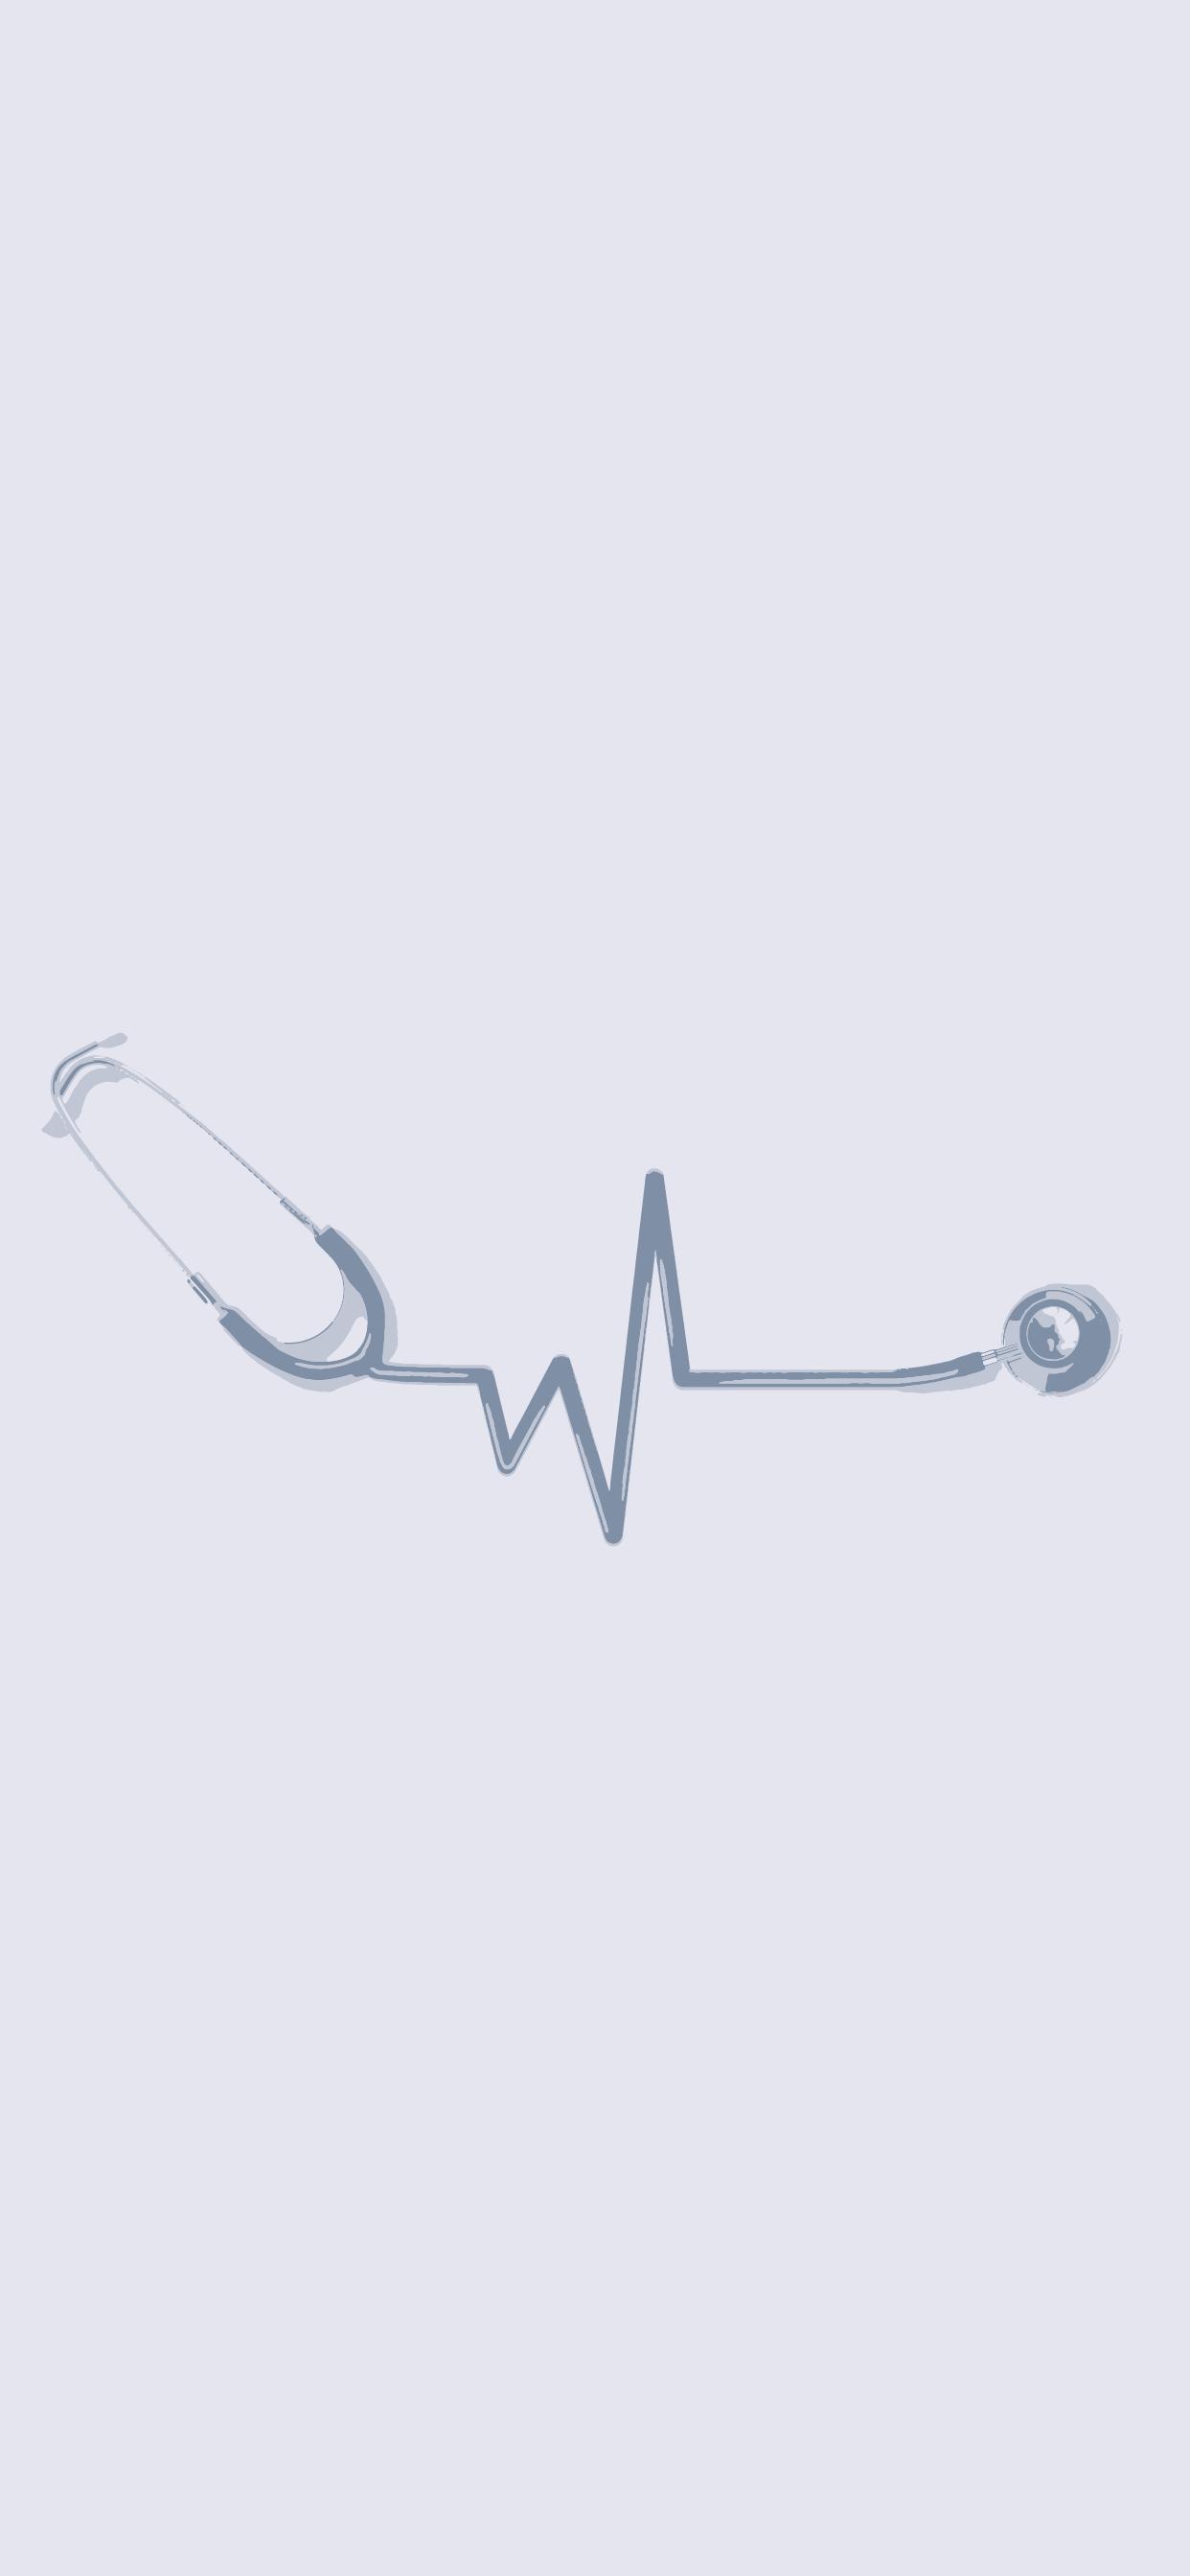 Medical wallpaper   stethoscope 1242x2688